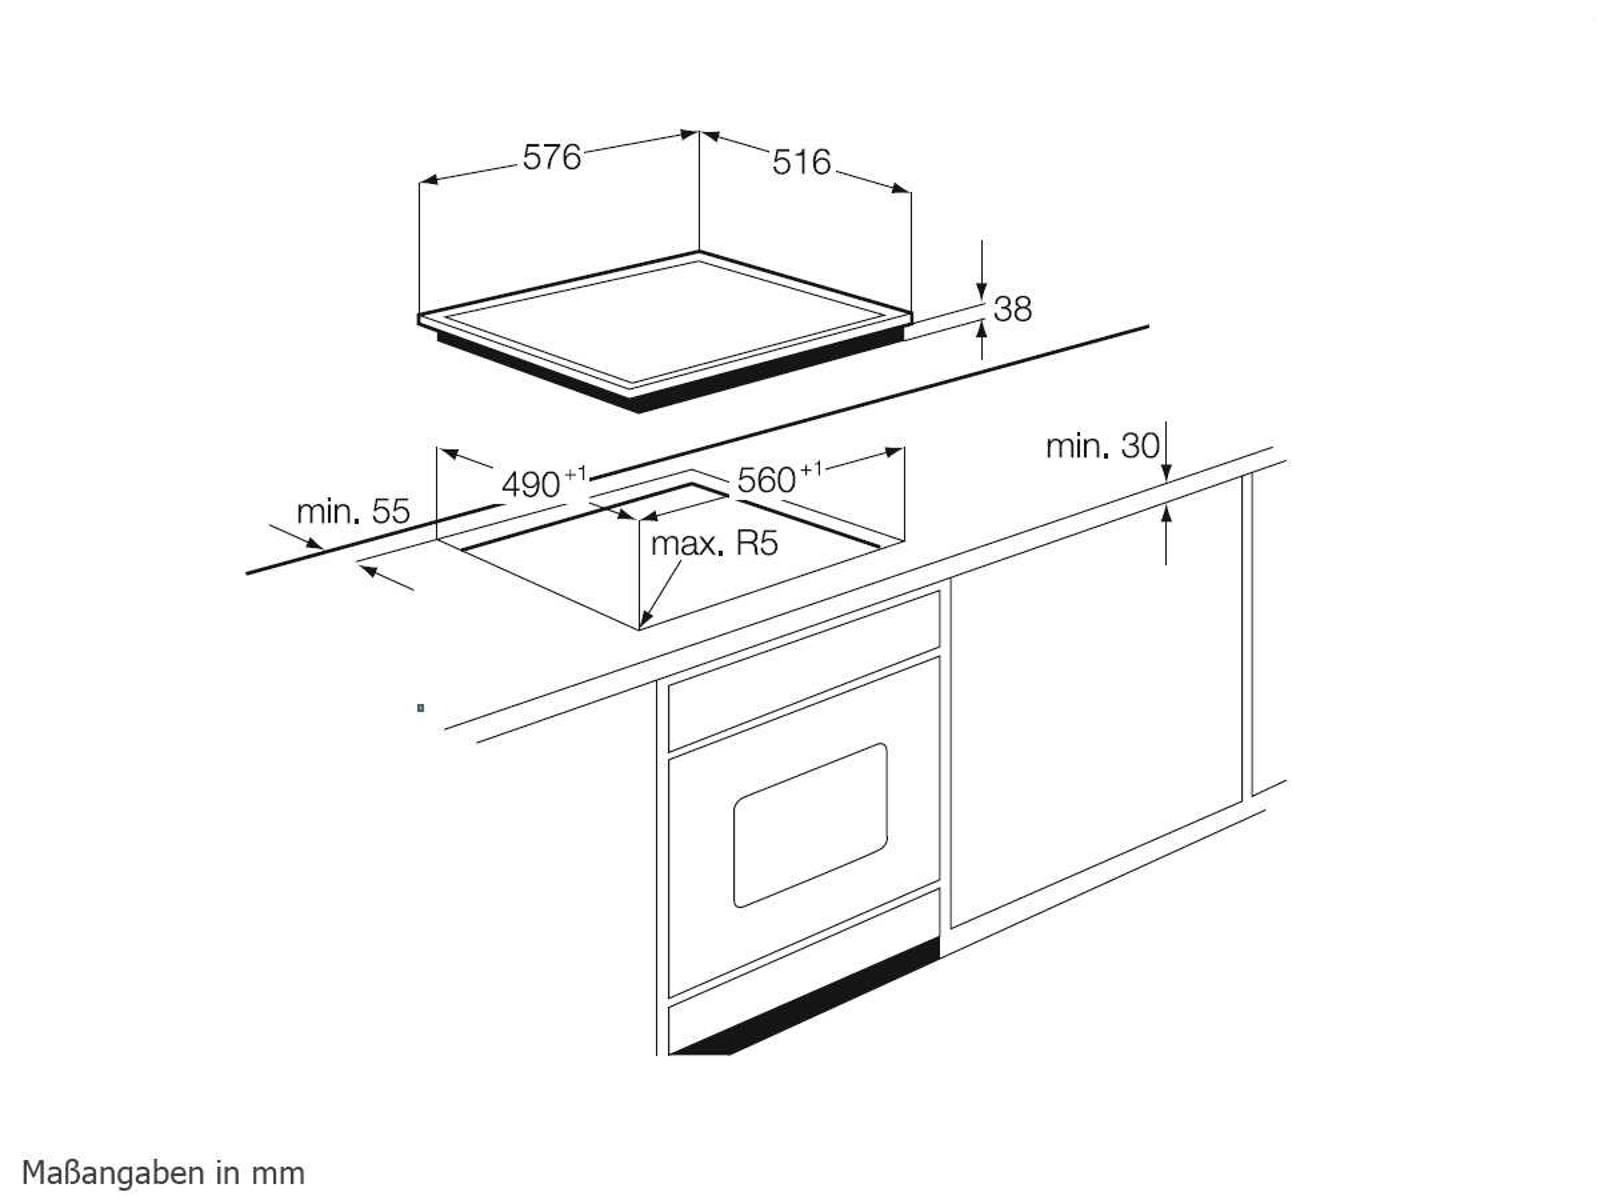 aeg he604000x b glaskeramikkochfeld herdgebunden. Black Bedroom Furniture Sets. Home Design Ideas